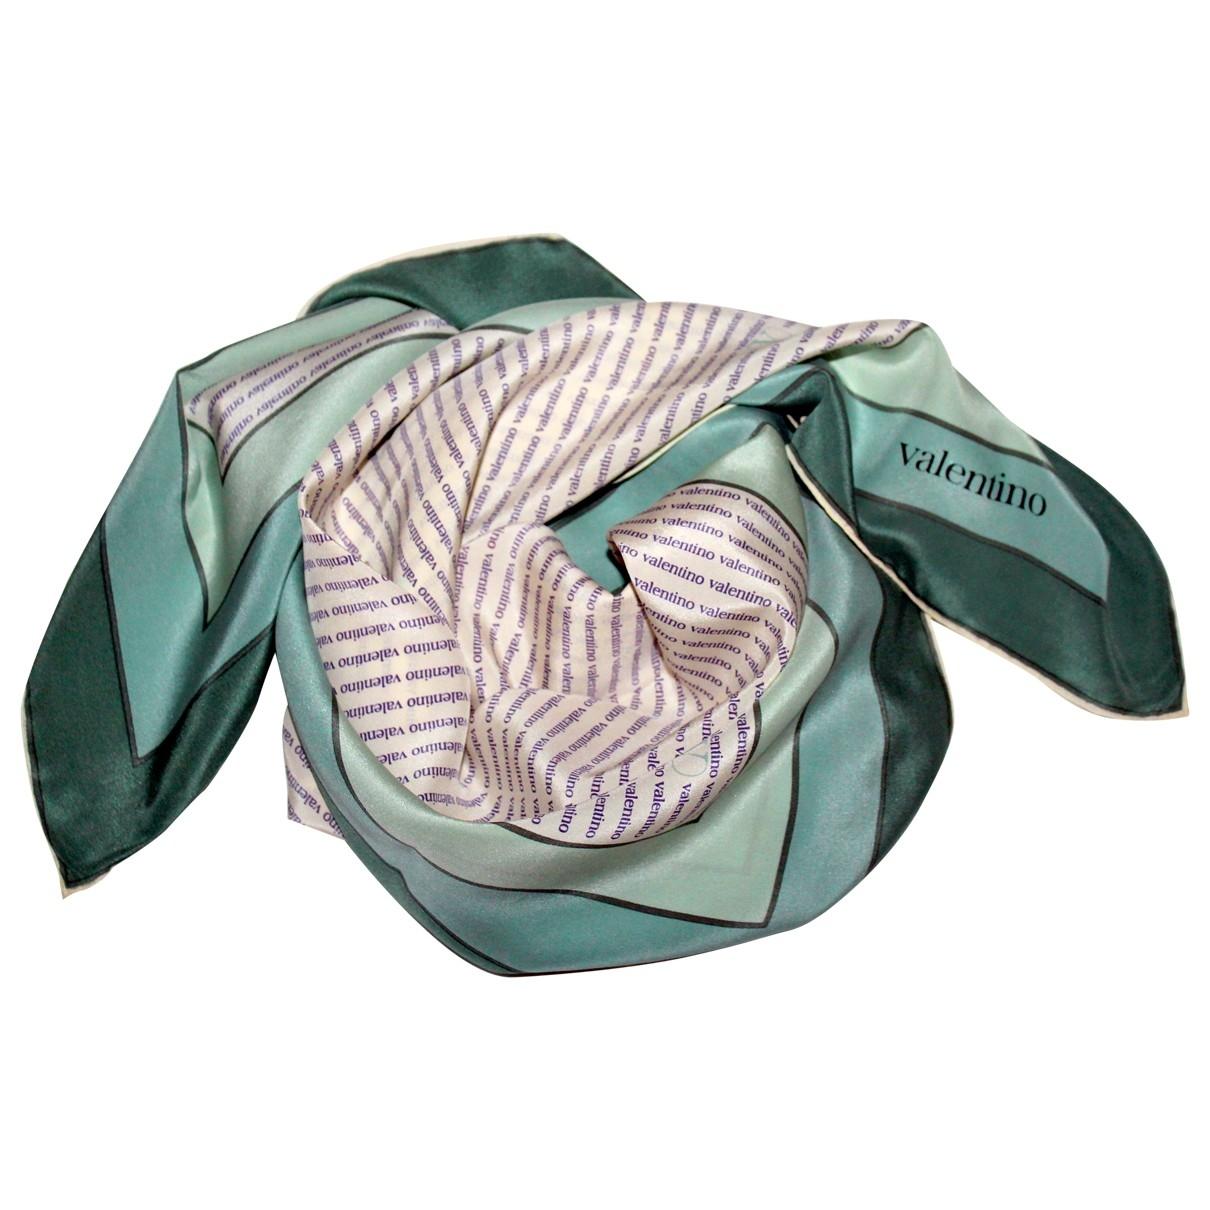 Valentino Garavani - Foulard   pour femme en soie - blanc